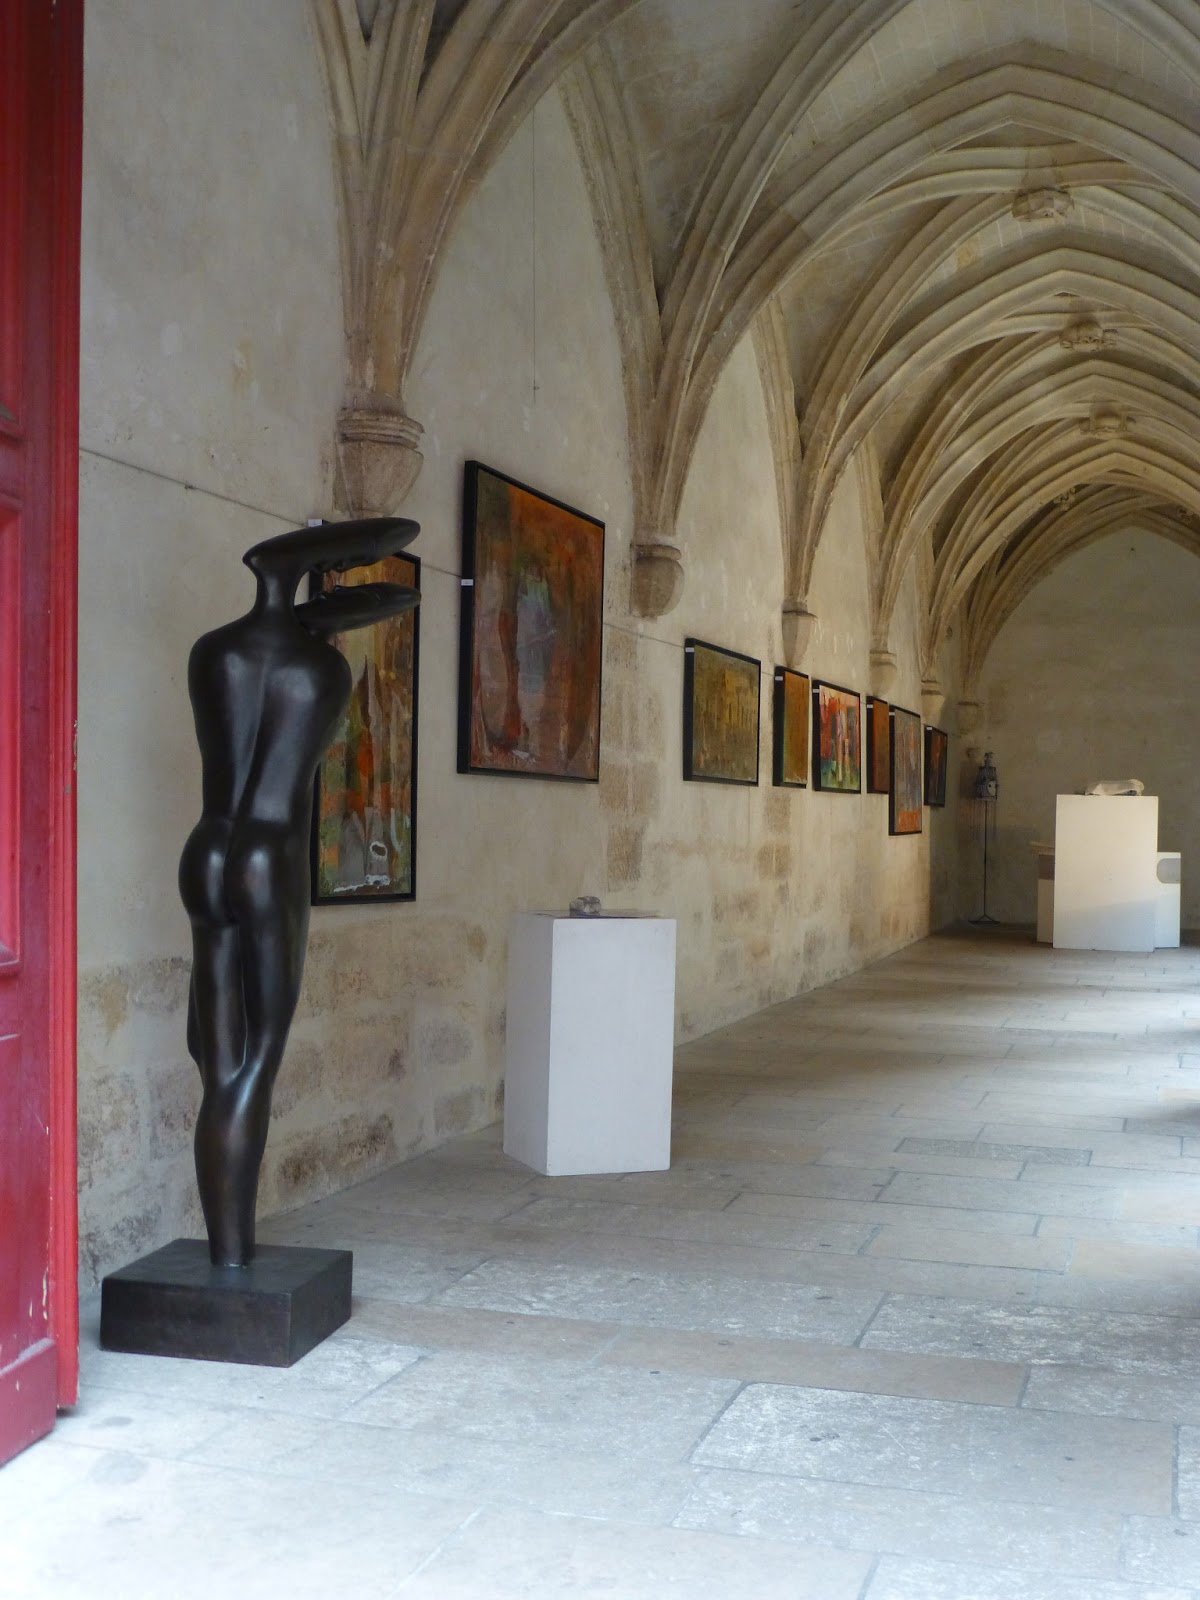 Foyer And Entryways Unlimited : Entrée to black paris™ africa unlimited at the cloître